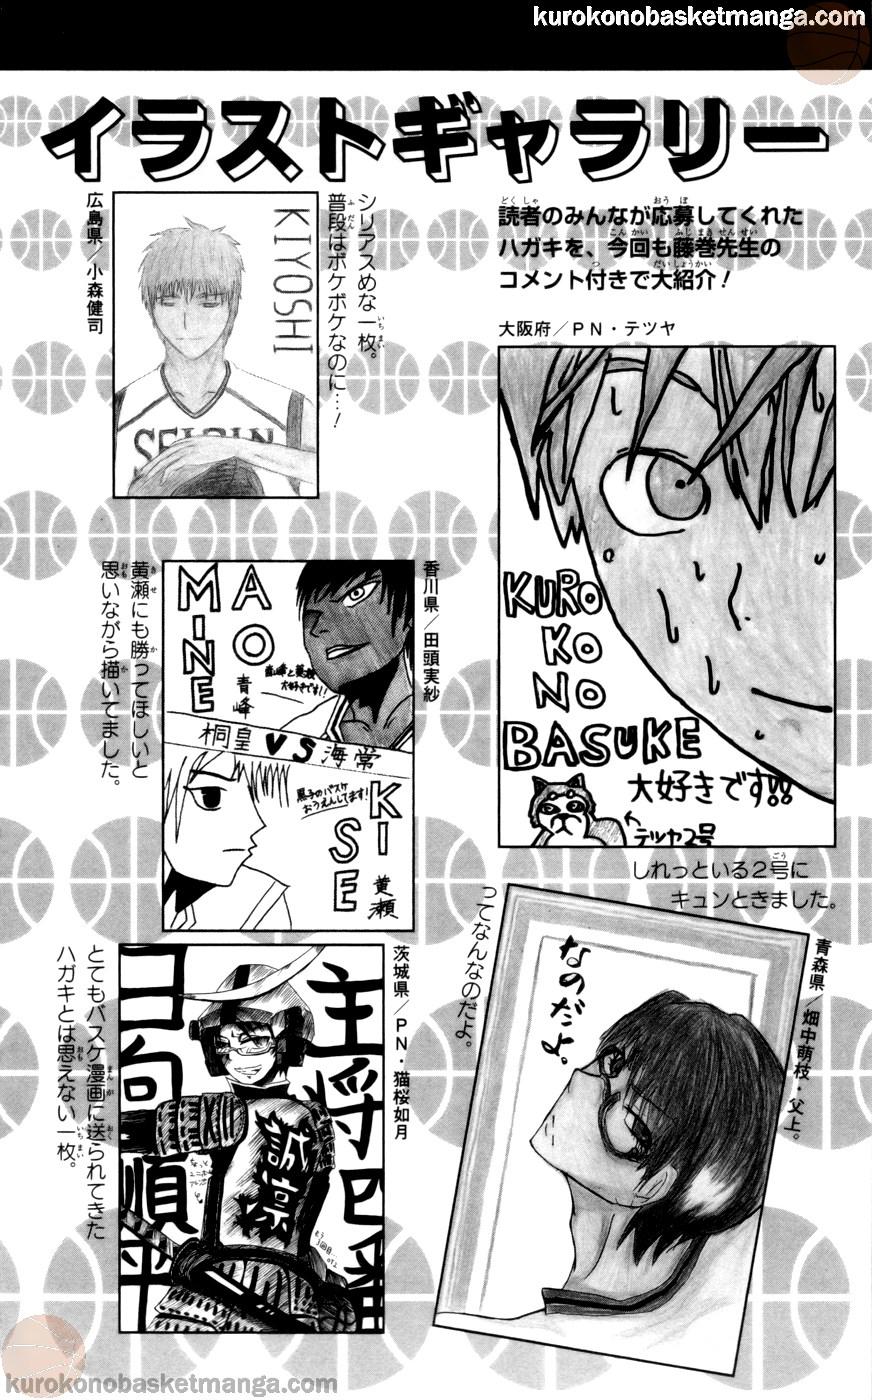 Kuroko no Basket Manga Chapter 89 - Image 24